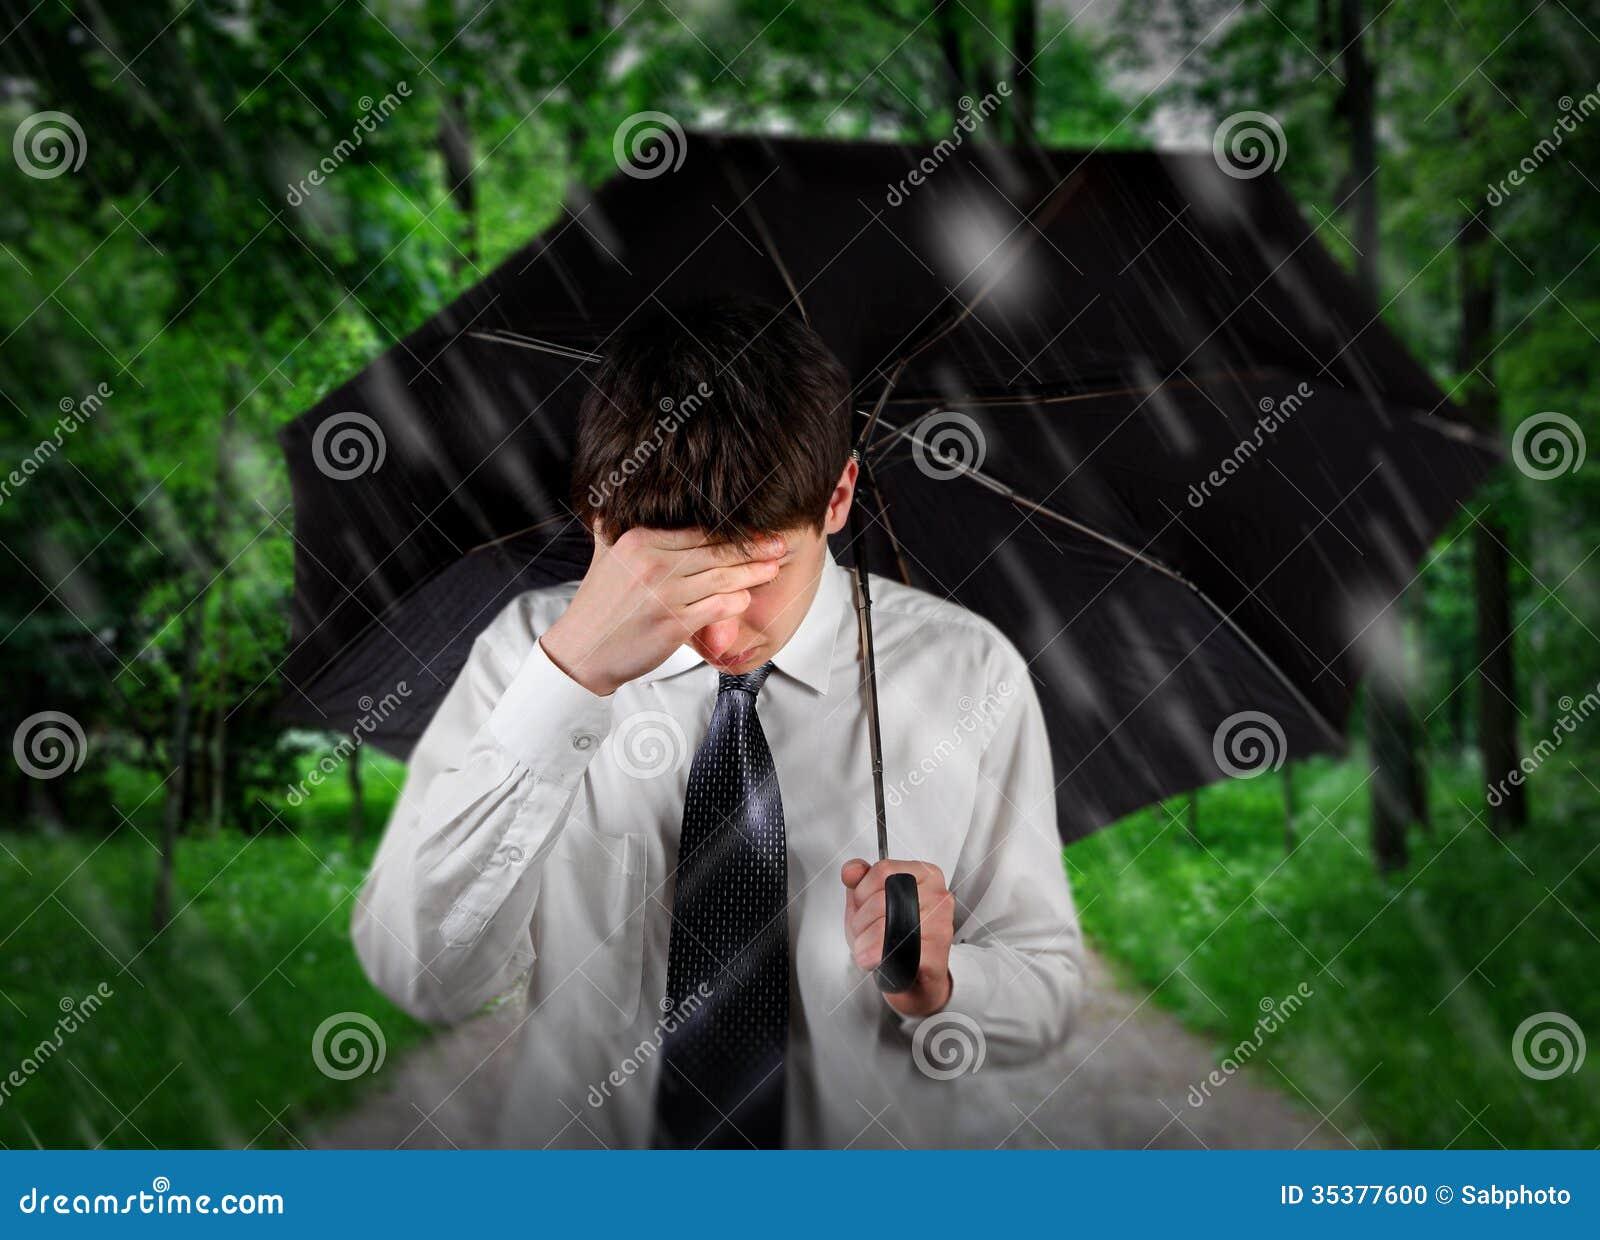 Sad Man Under Rain Stock Photo - Image: 35377600